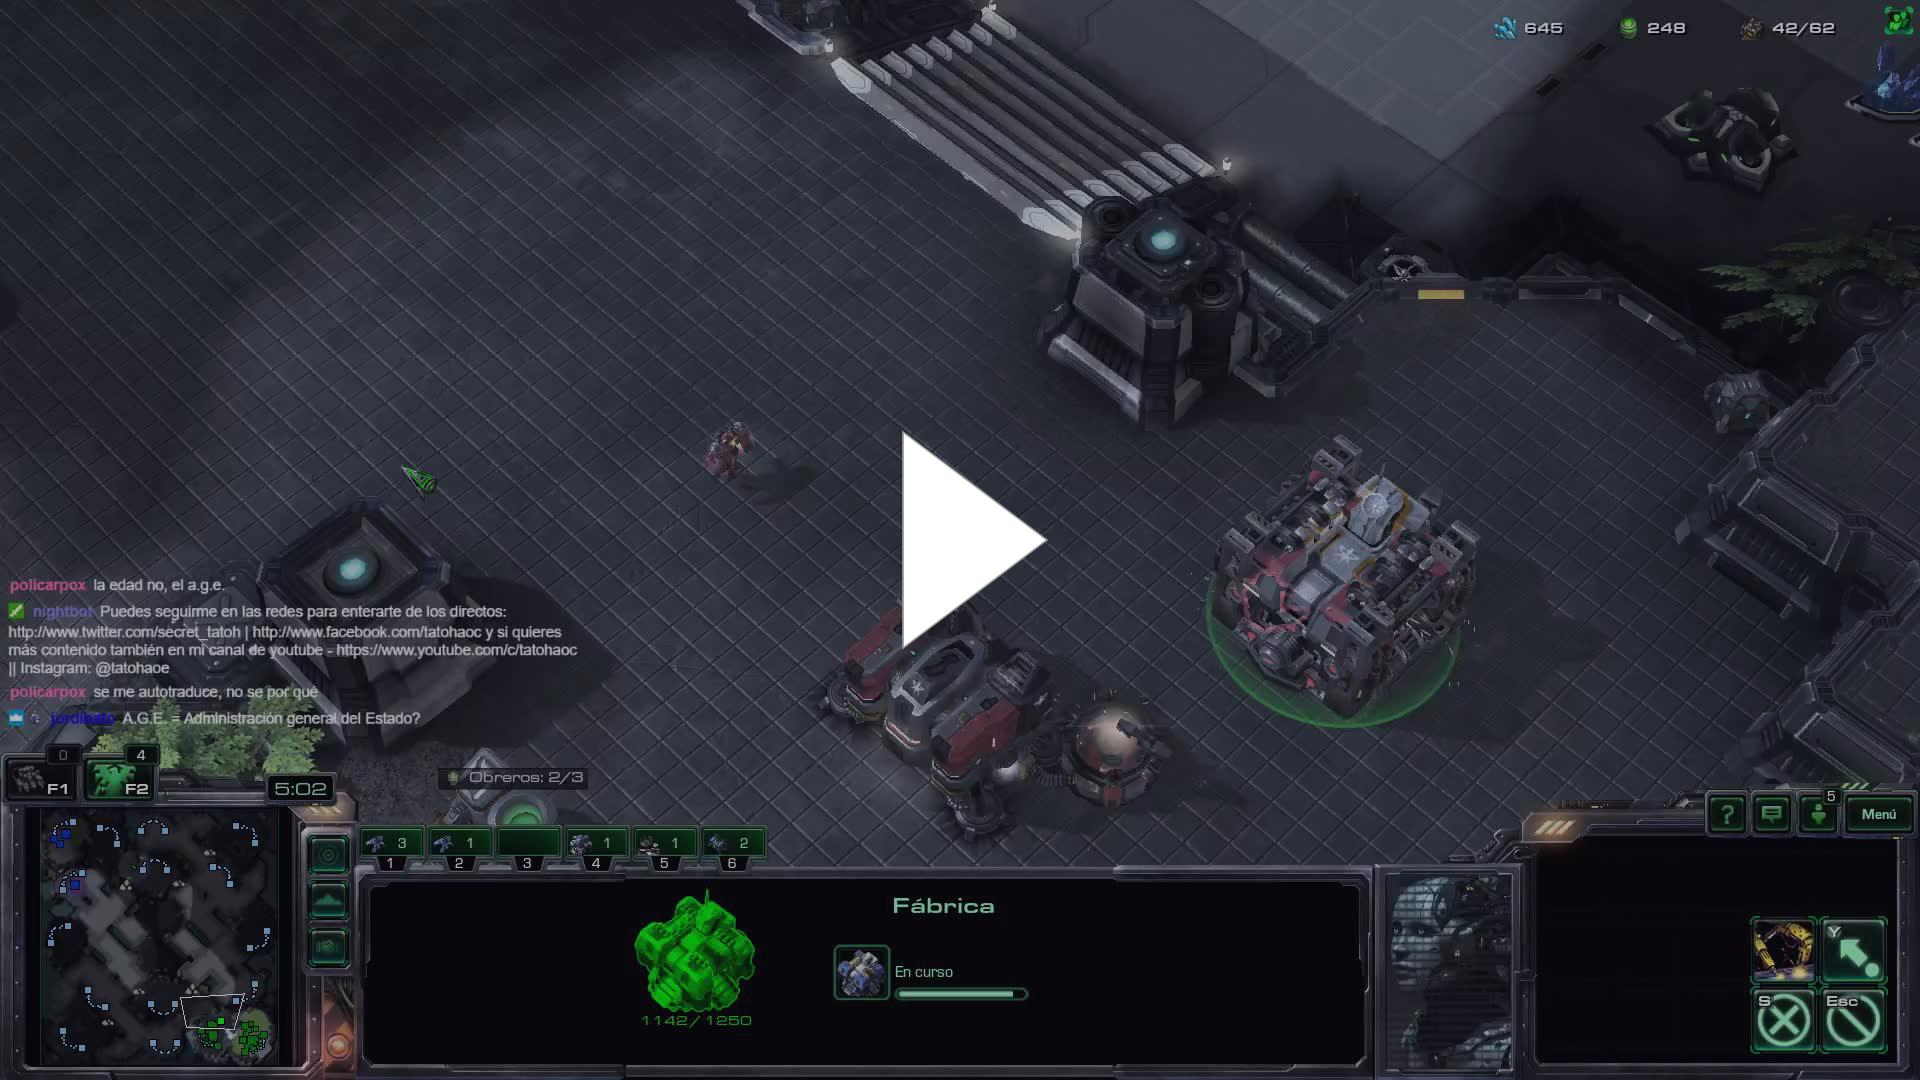 Tatohaoe Dando Penita Al Starcraft Ii Twitch